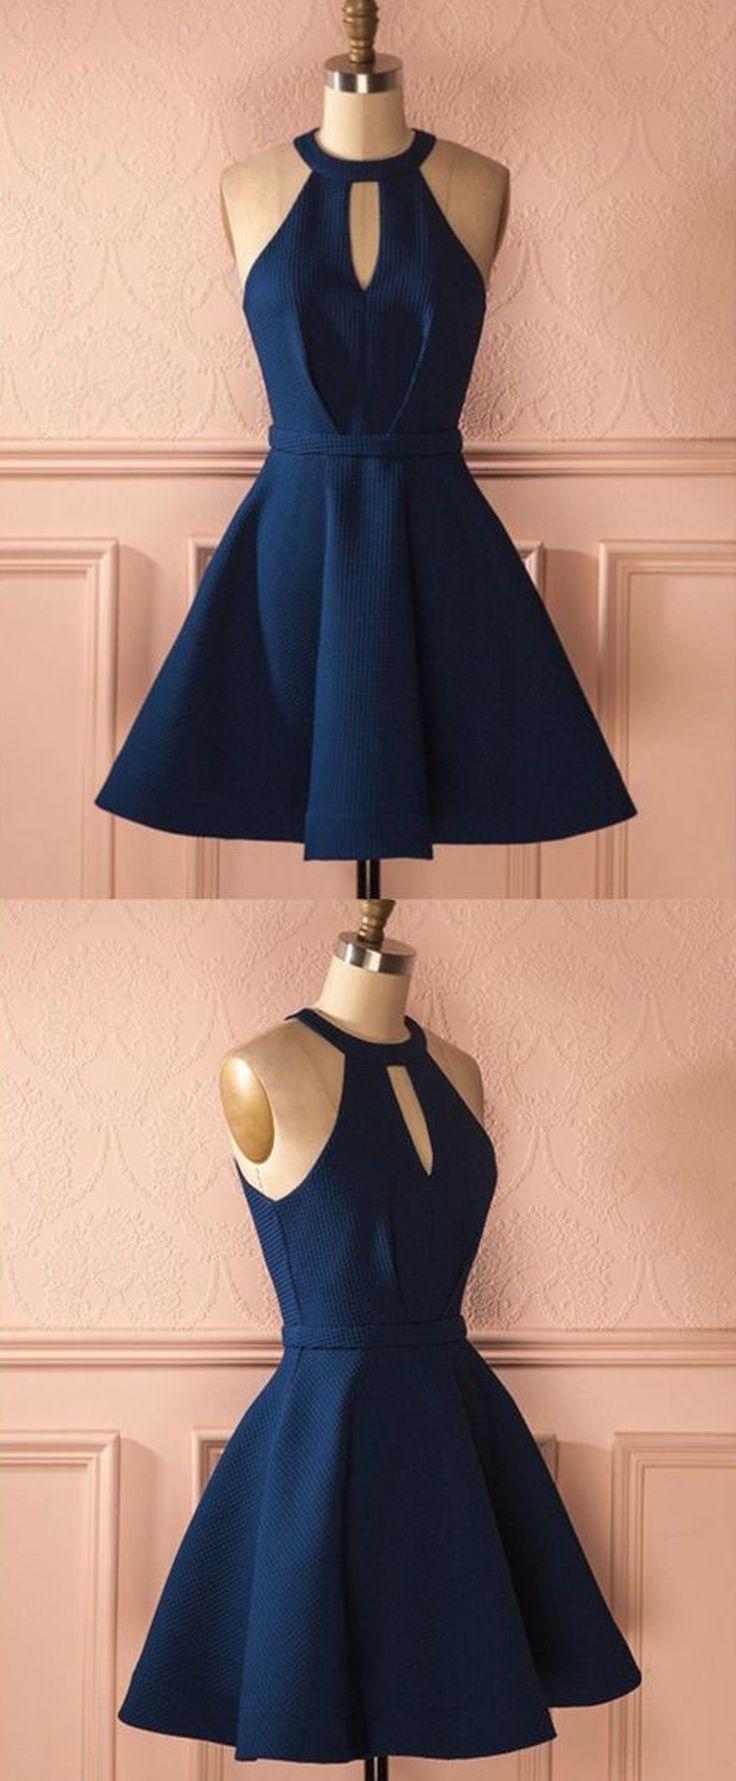 Süßes A-Linie Halfter dunkelblaues kurzes Kleid, elastischer Satin